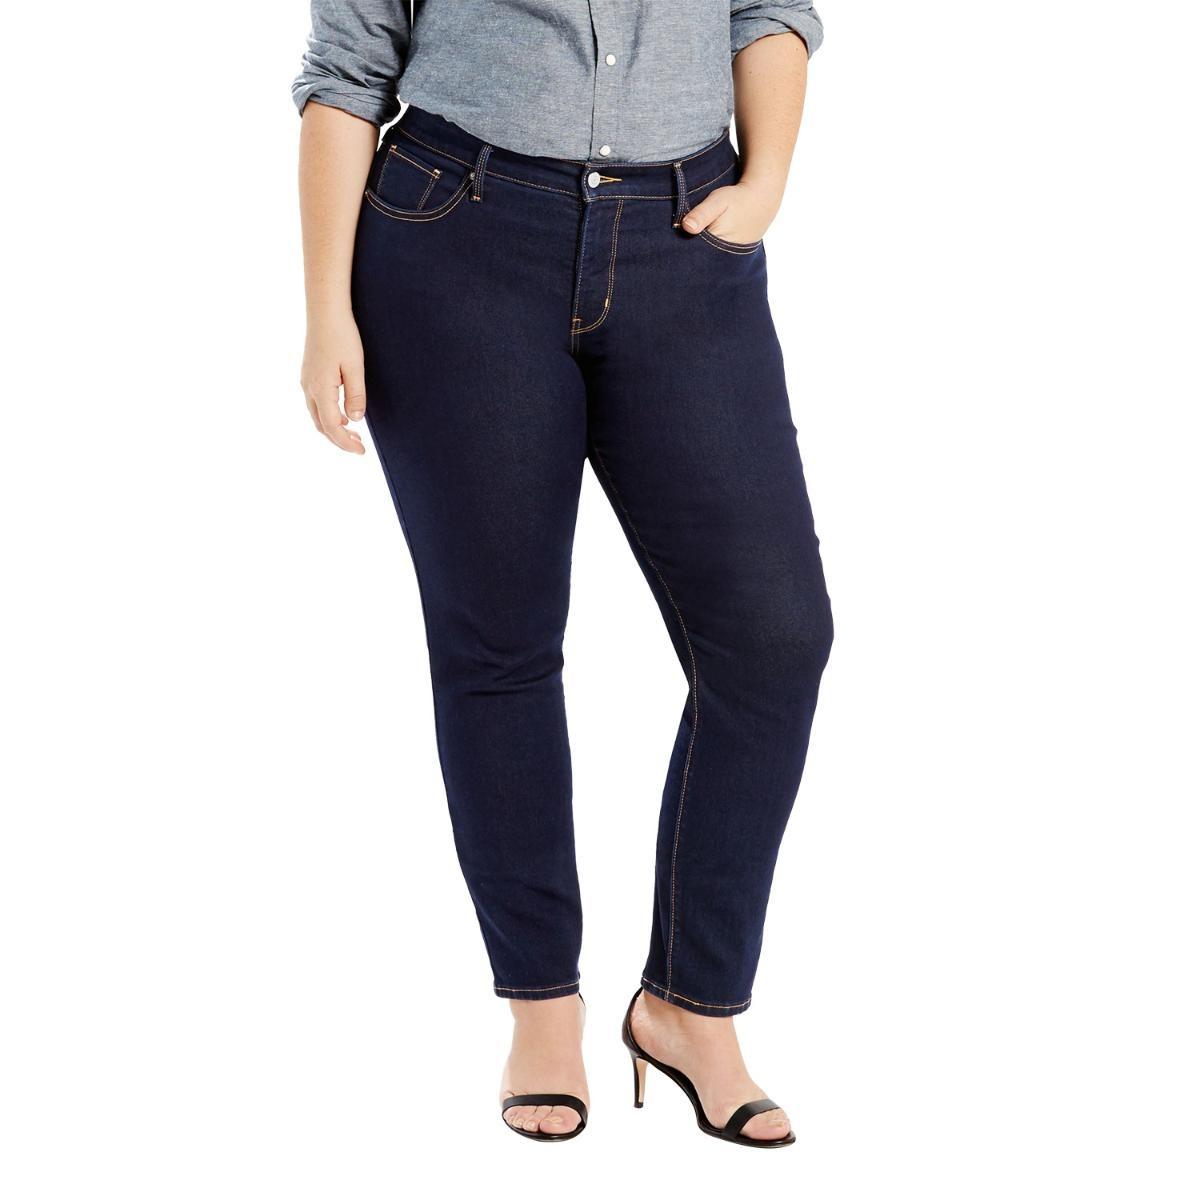 bd5bfd7661ac4 calça jeans women levis 311 shaping skinny plus size escura. Carregando  zoom.